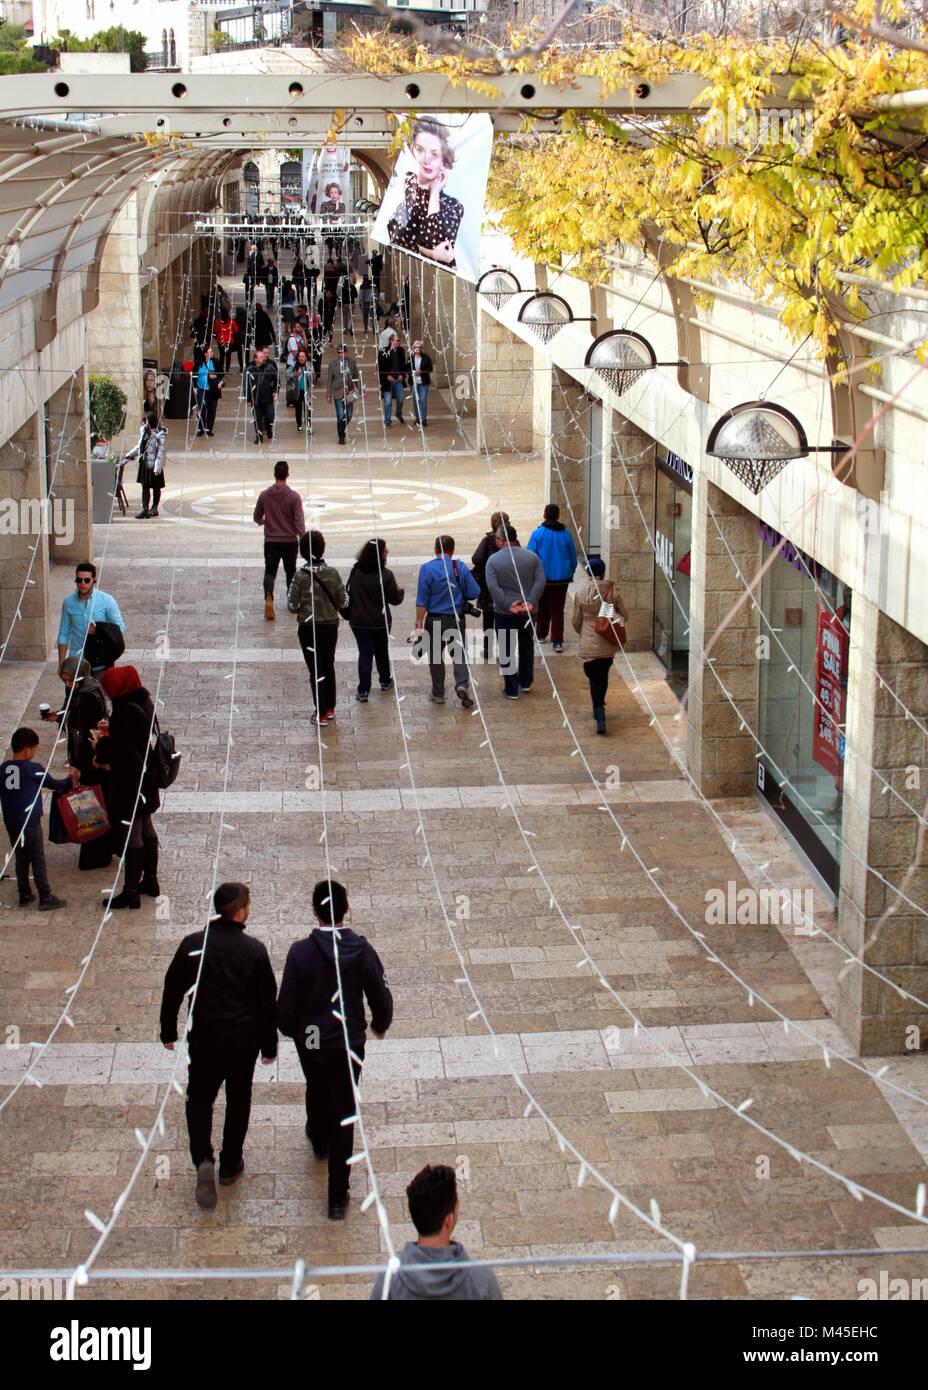 People walk through the Mamilla pedestrian mall below Jerusalem's Old City Jaffa Gate plaza. - Stock Image